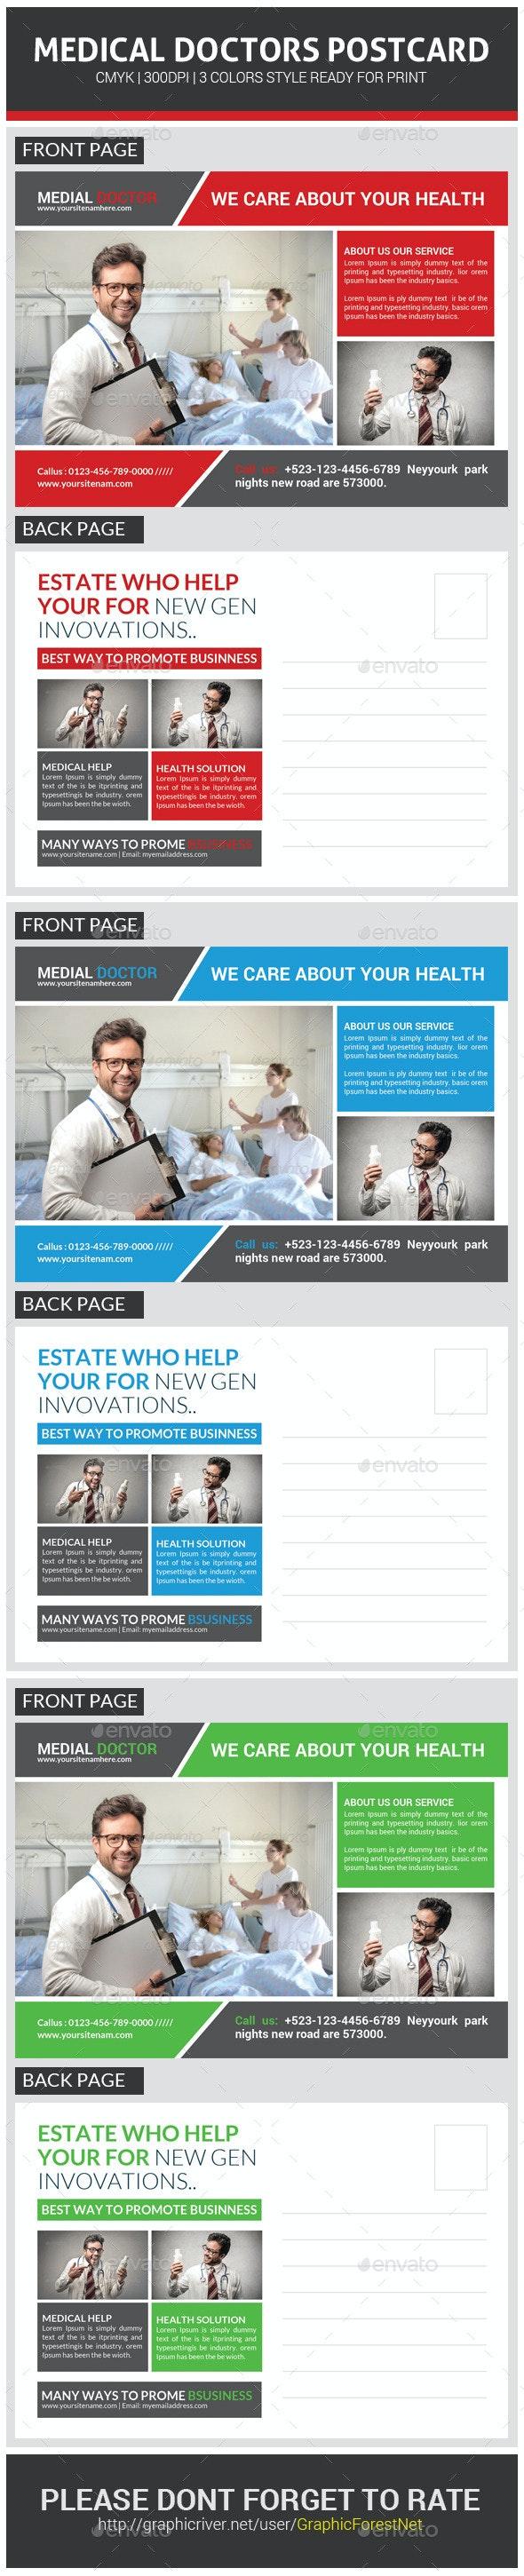 Medical Doctors Postcard Template - Cards & Invites Print Templates